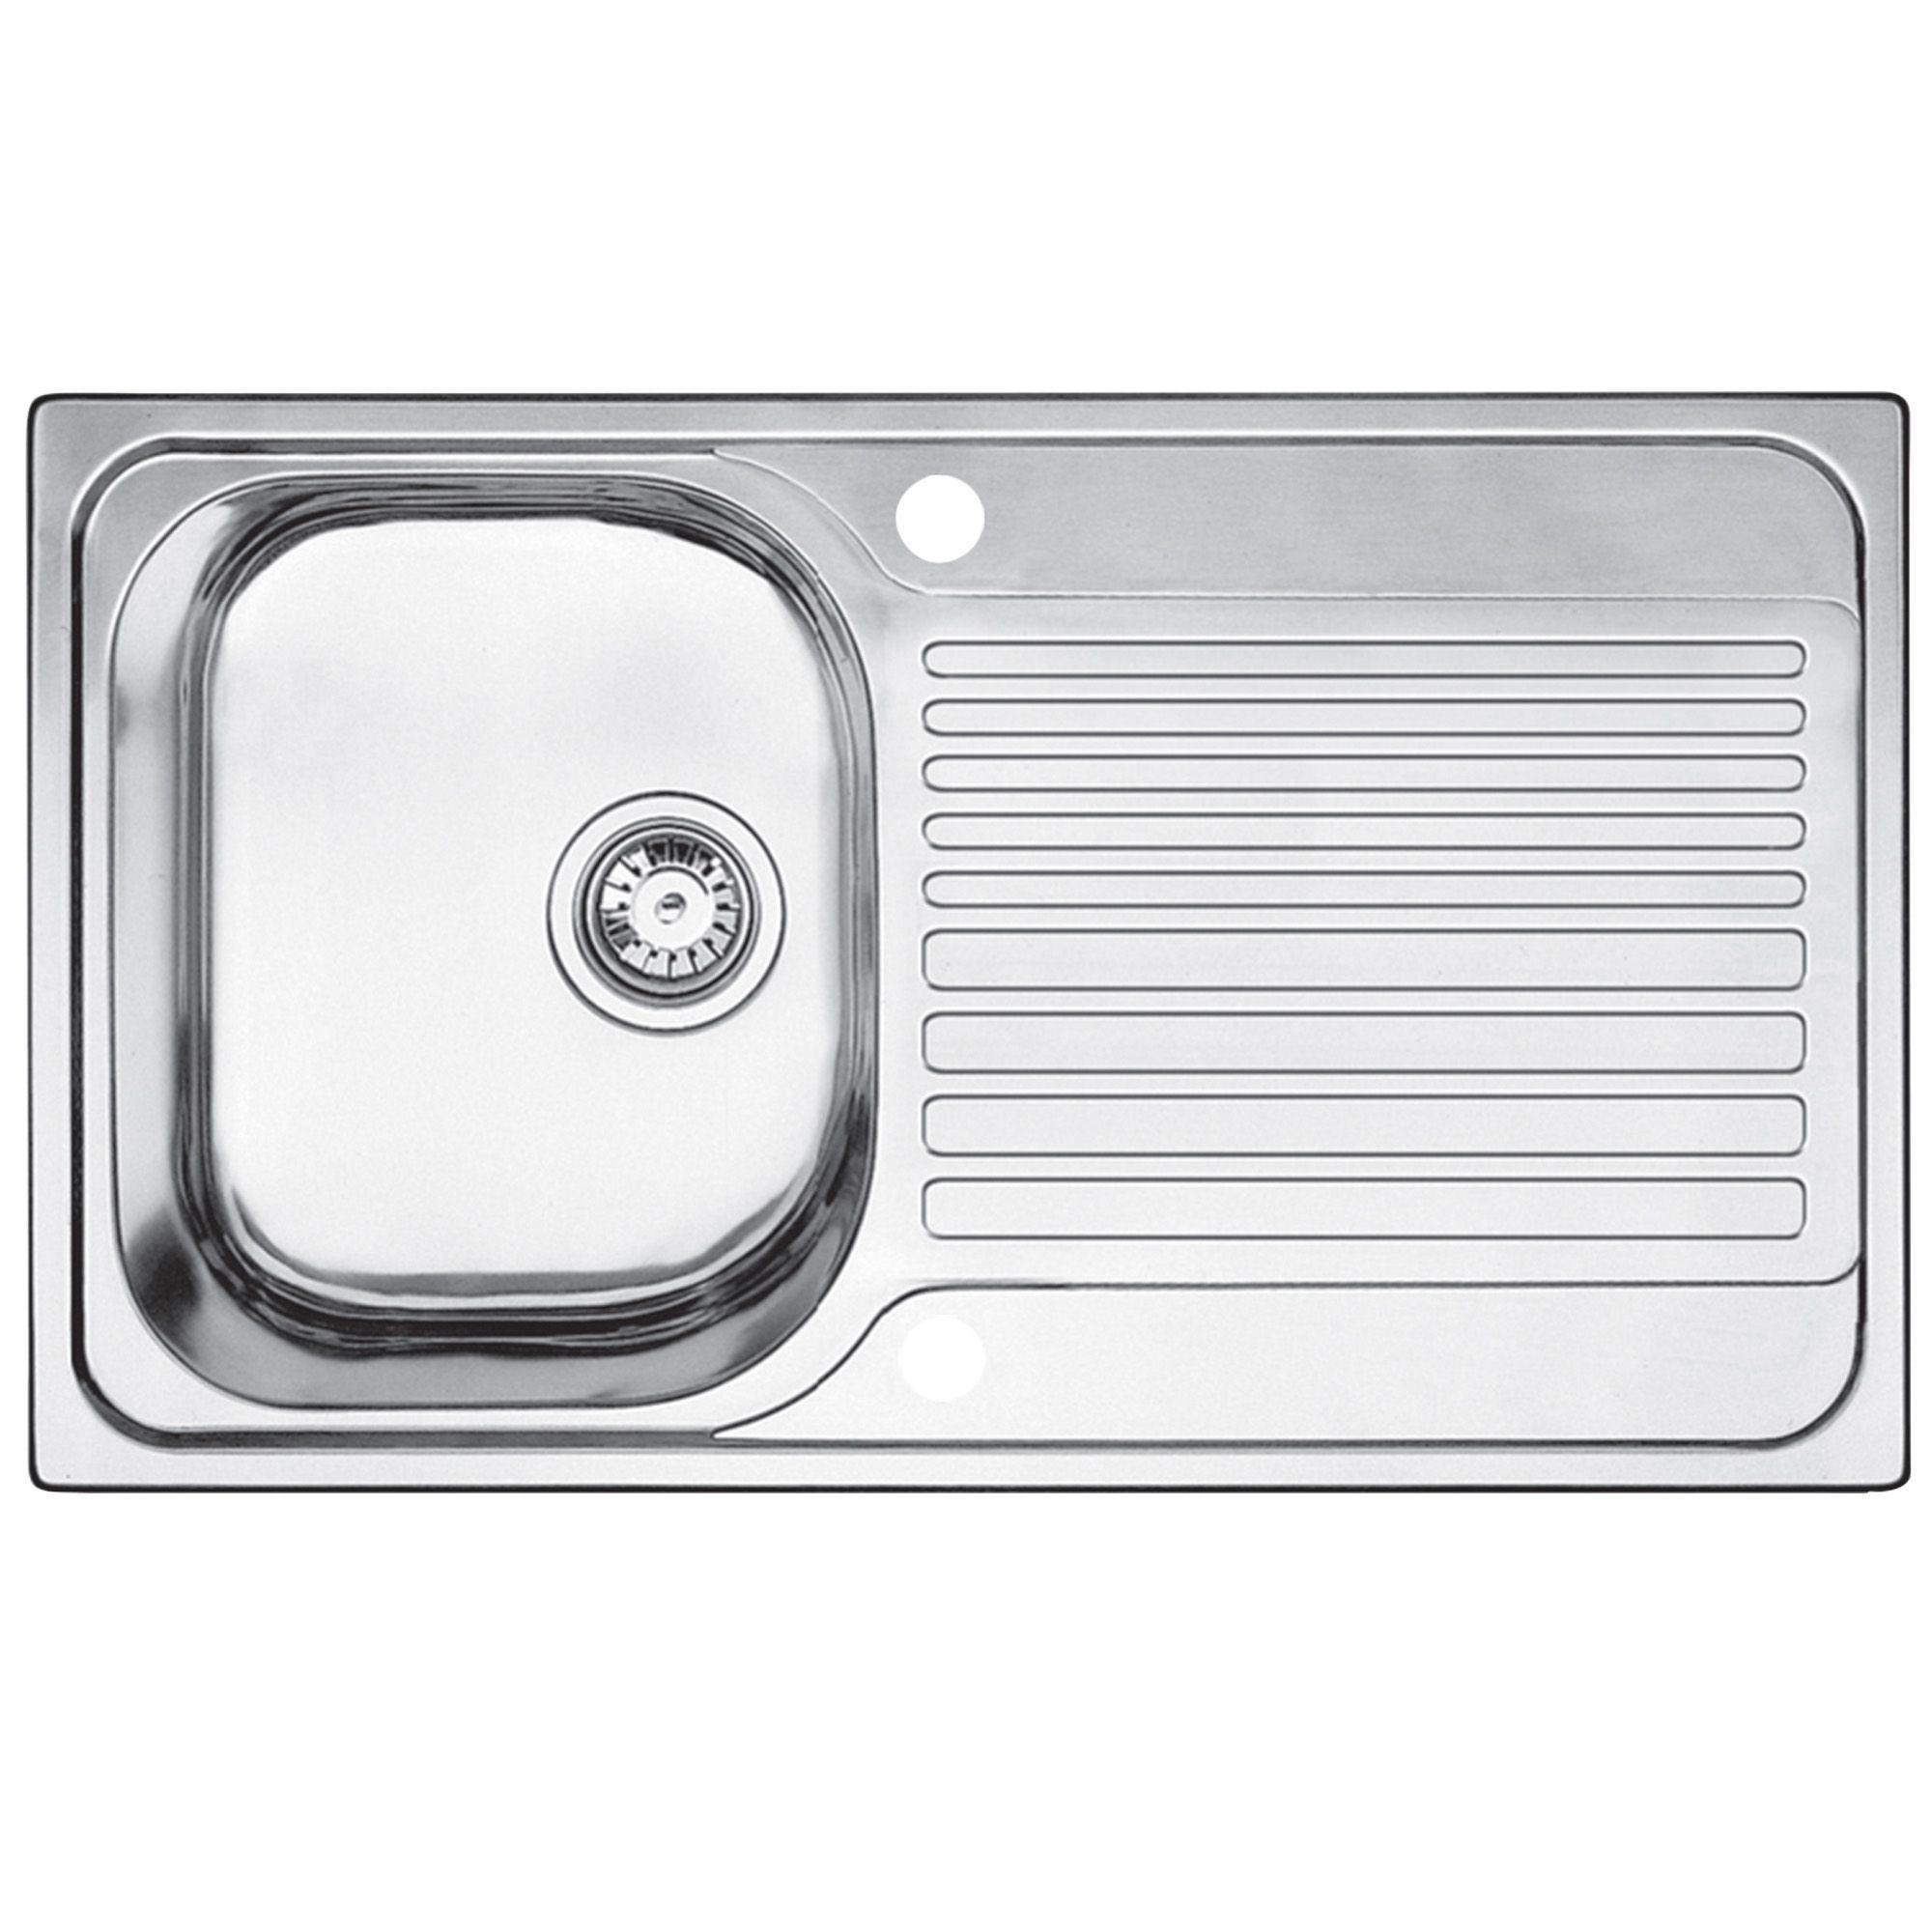 Compact Kitchen Sinks Blanco toga 1 bowl stainless steel compact sink drainer blanco toga 1 bowl stainless steel compact sink drainer departments diy at bq workwithnaturefo